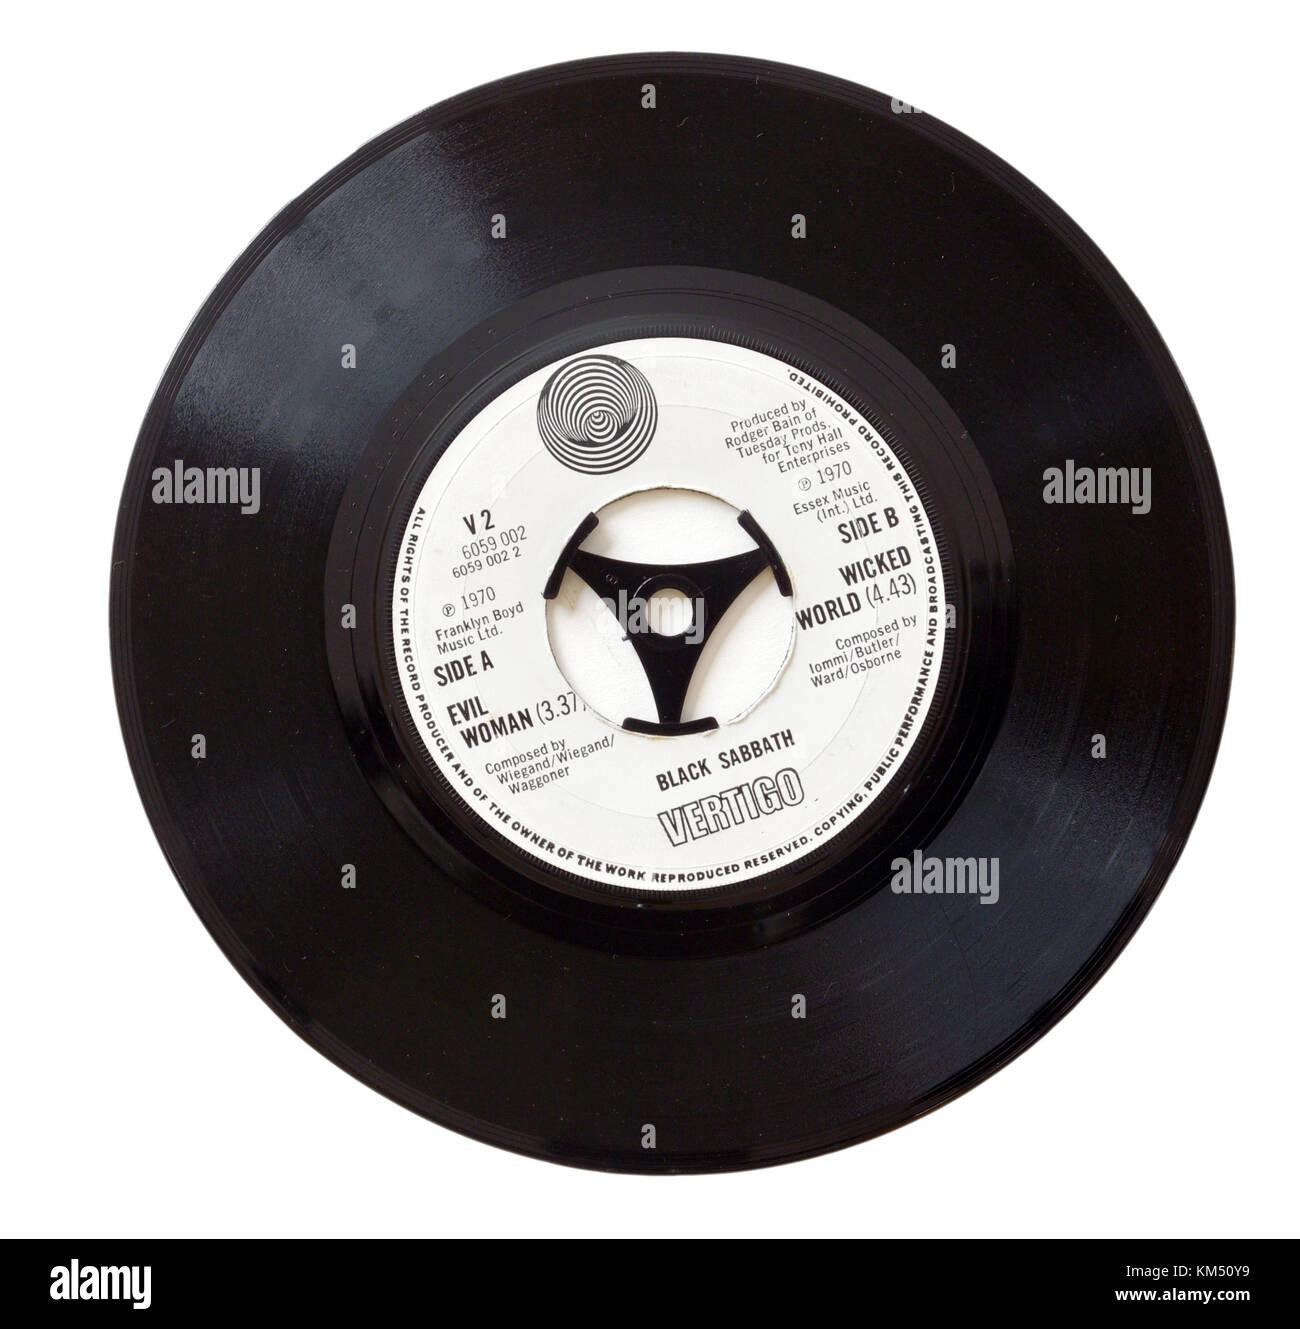 Black Sabbath Evil Woman seven inch single on the Vertigo spiral label - Stock Image